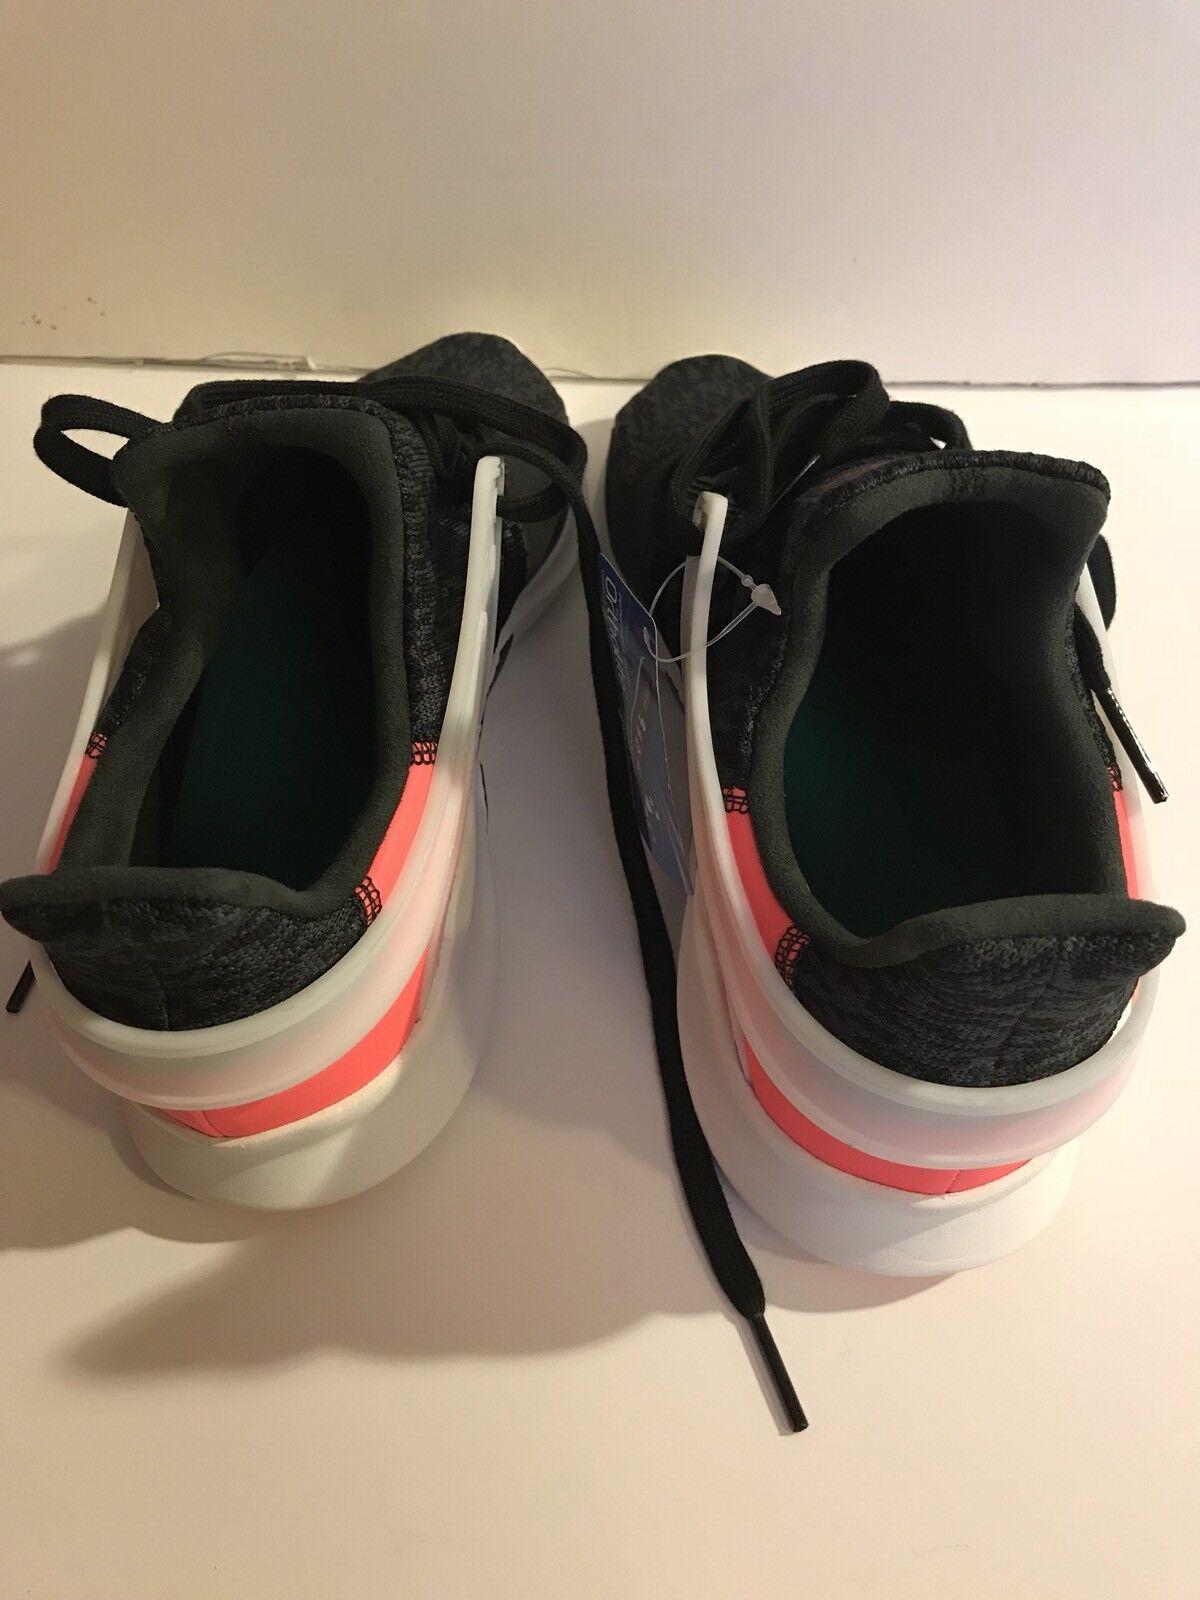 Adidas equipment adv 91-16 eqt primeknit rosa weiß - bb schwarz größe 12 art bb - 1302 b6b6c7